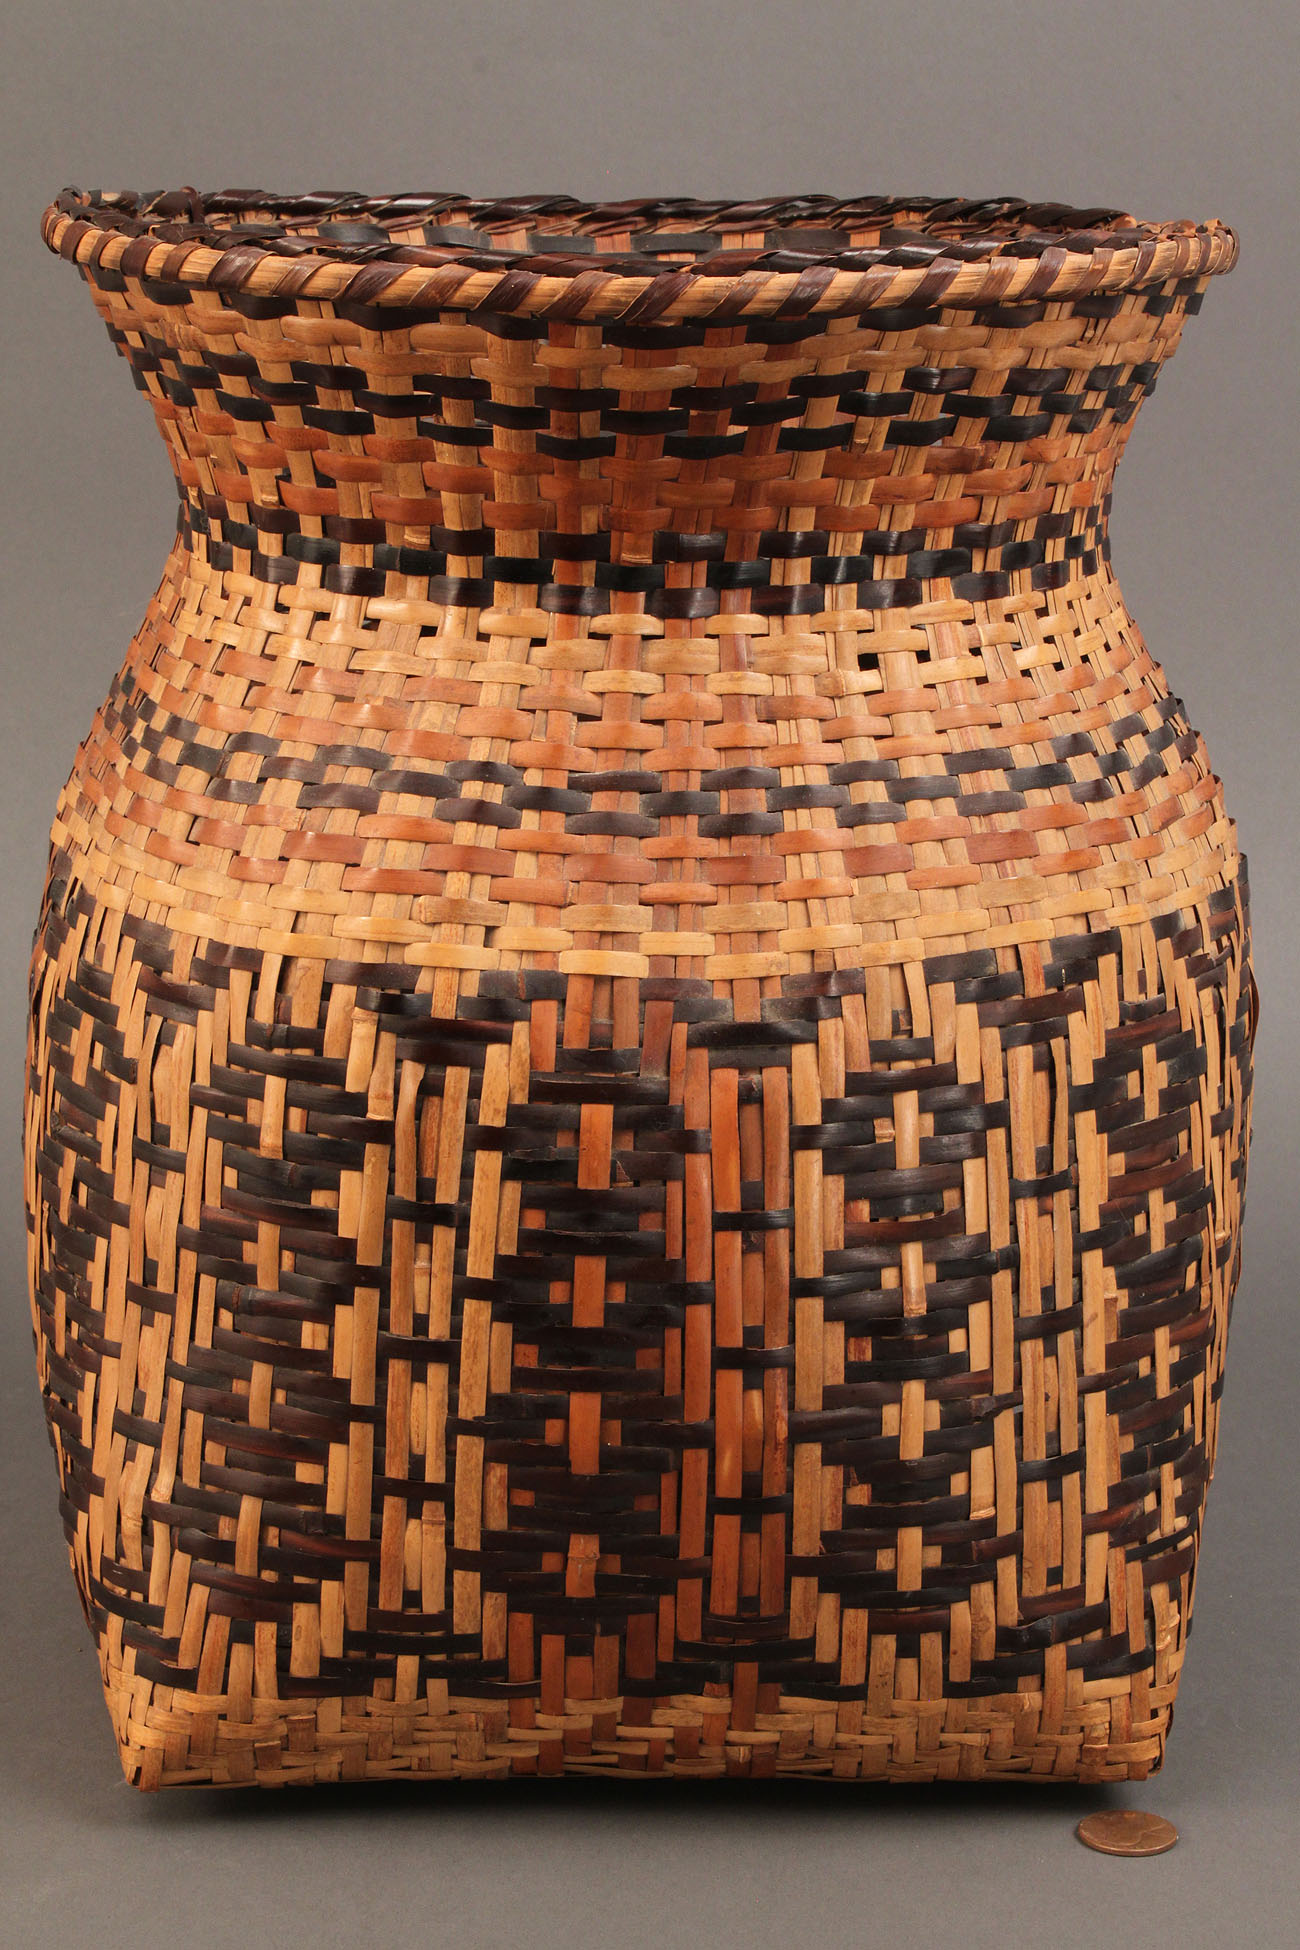 Basket Weaving North Carolina : Lot cherokee rivercane storage basket quot height